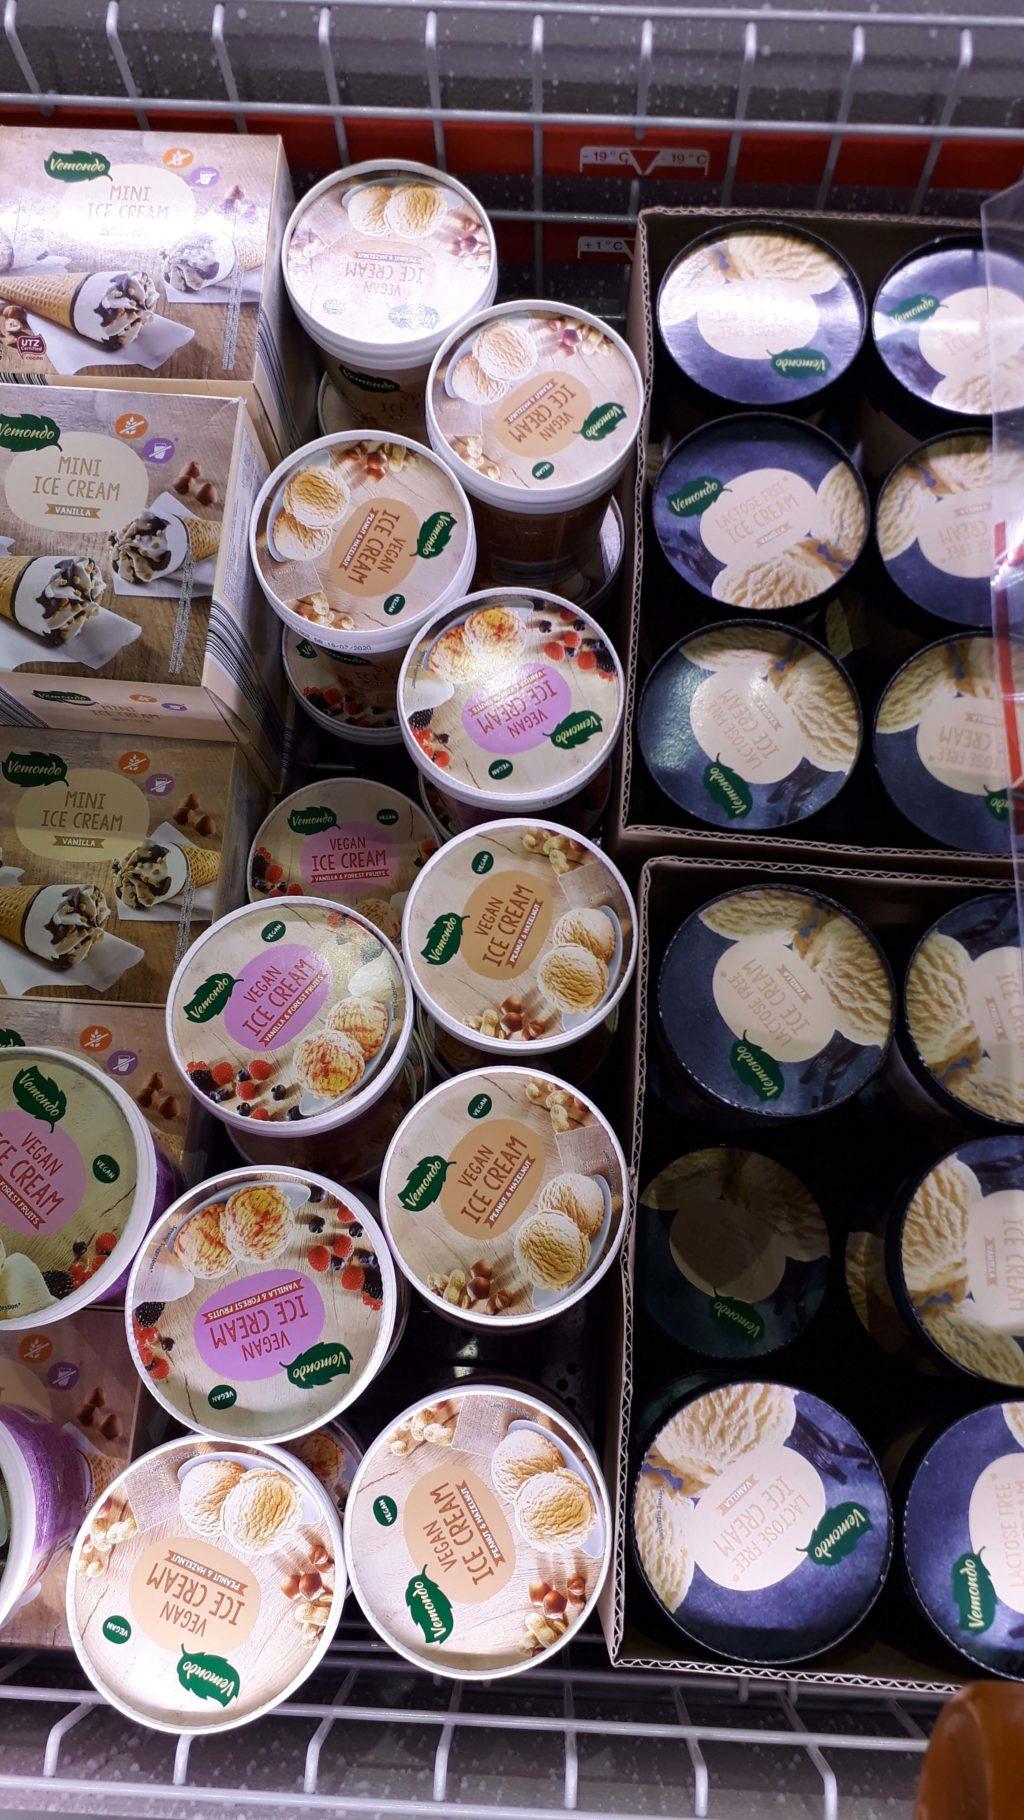 Vegan ice cream with peanut hazelnut or vanilla forest fruit varieties